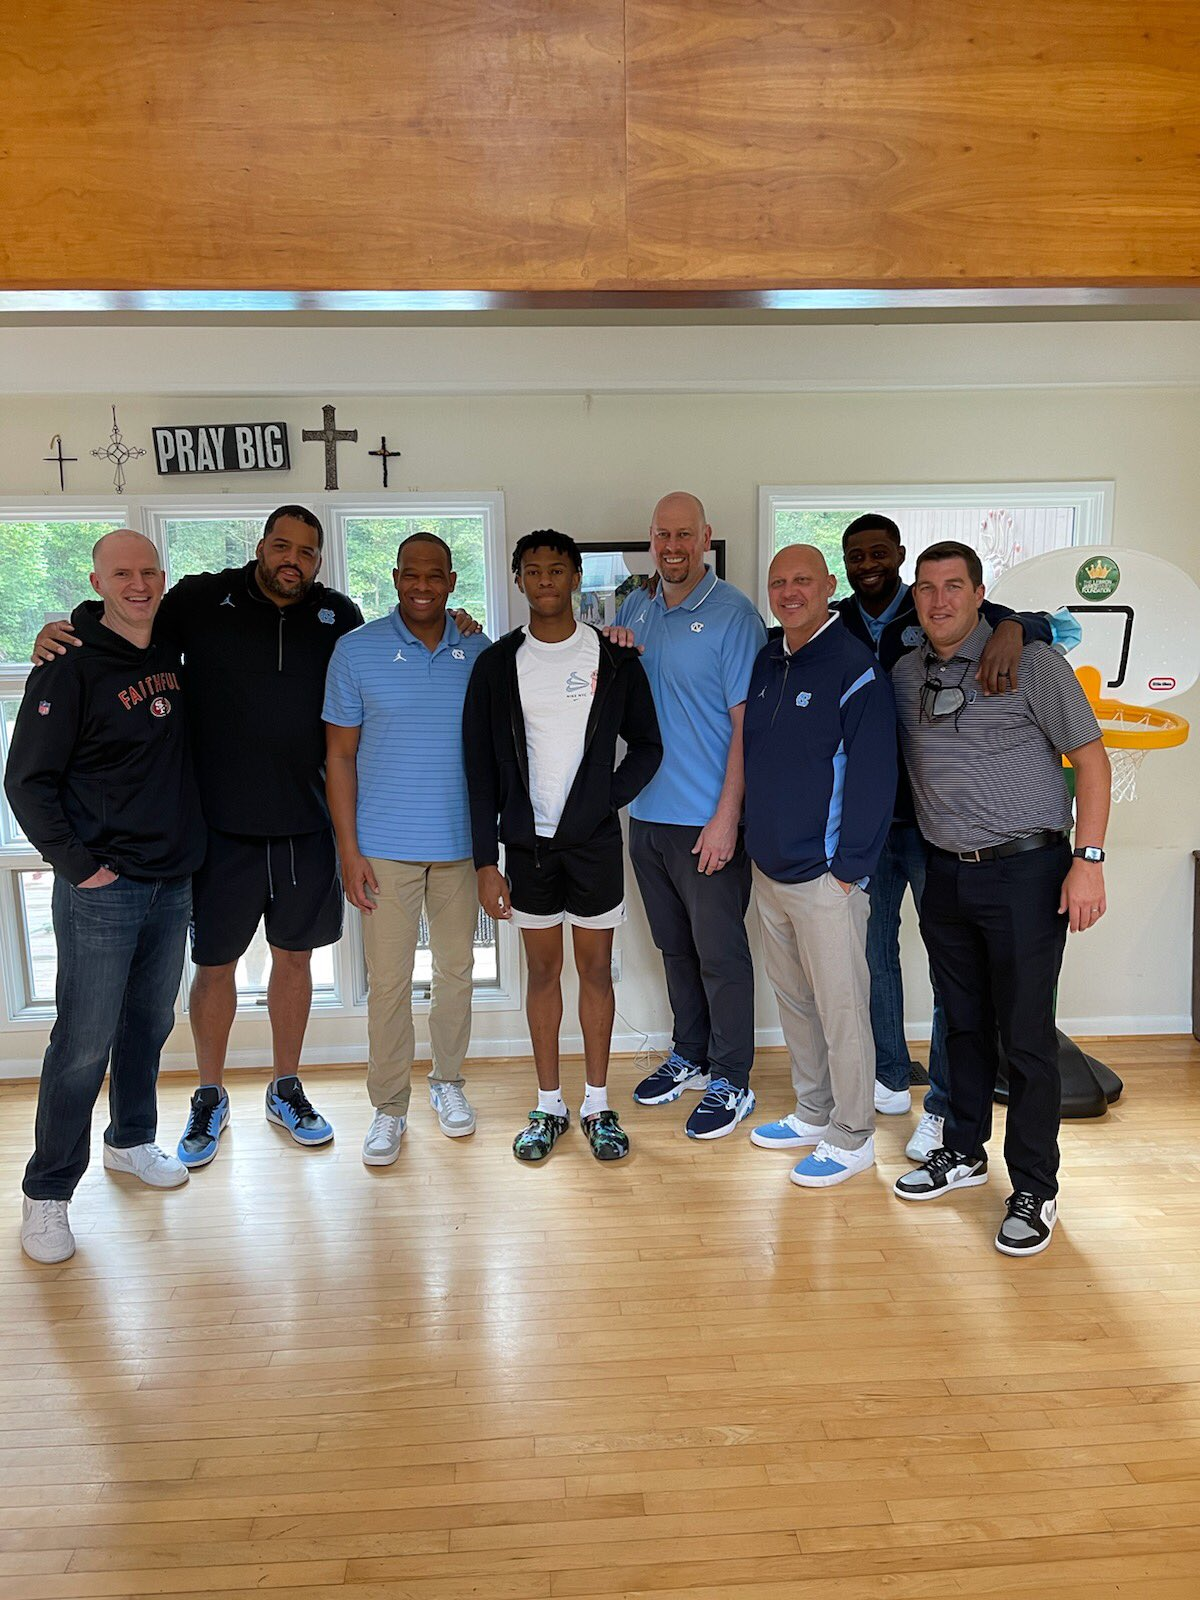 Five-star guard Simeon Wilcher visits North Carolina, gets the love